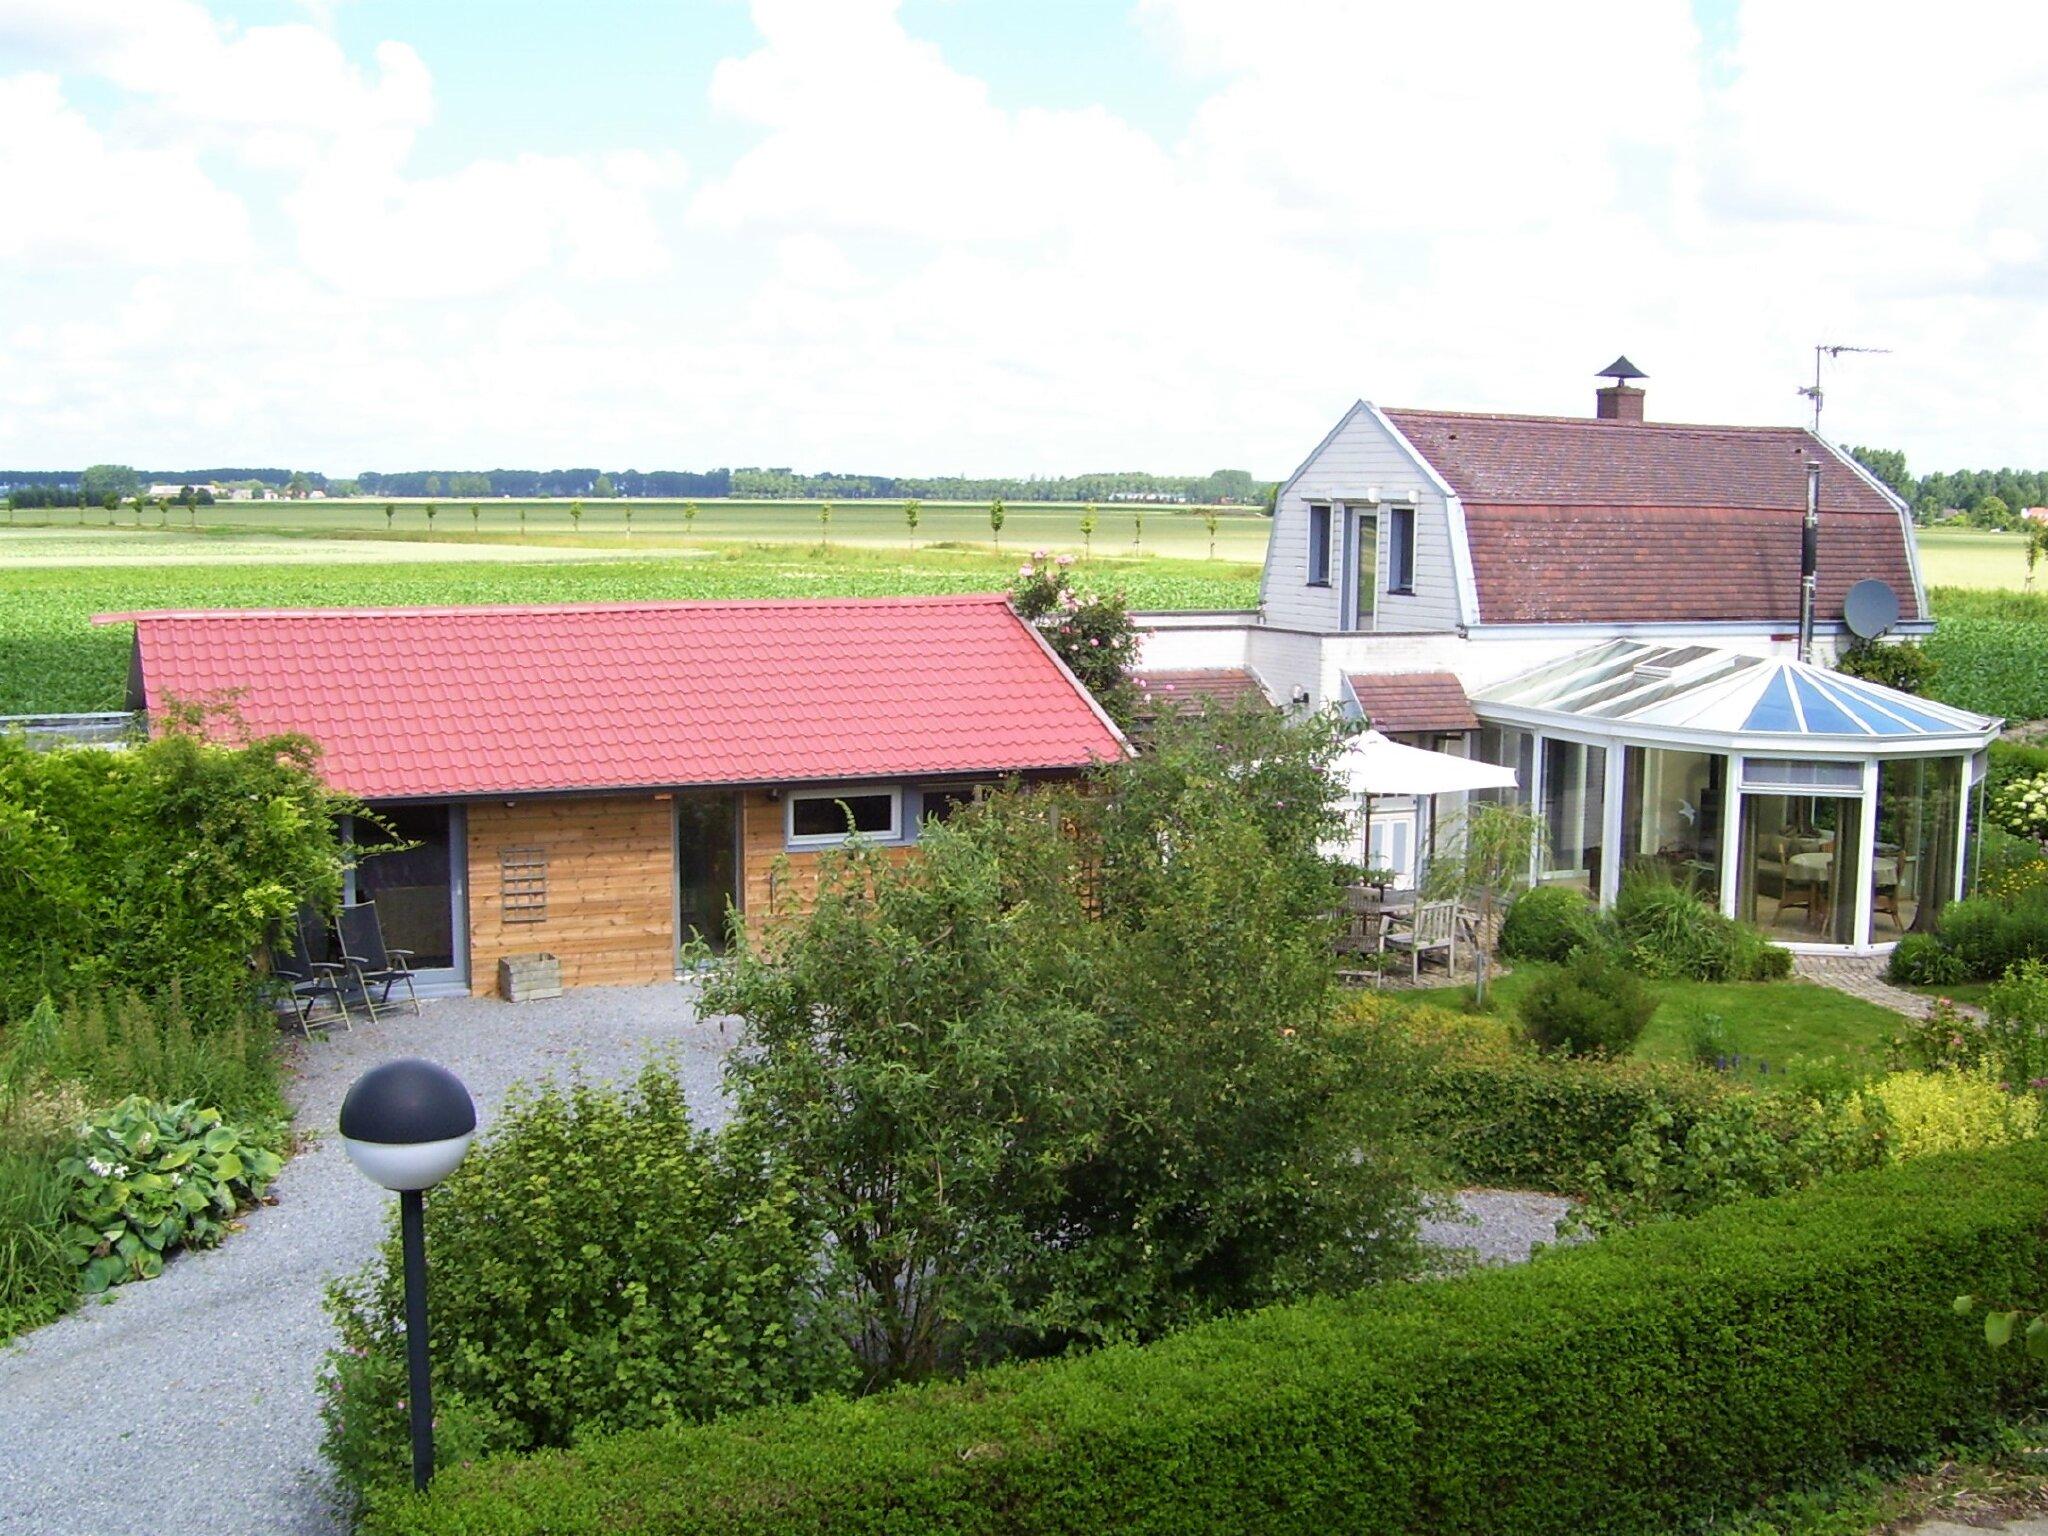 Ferienhaus Kruisdijk 2 - Feriensluis